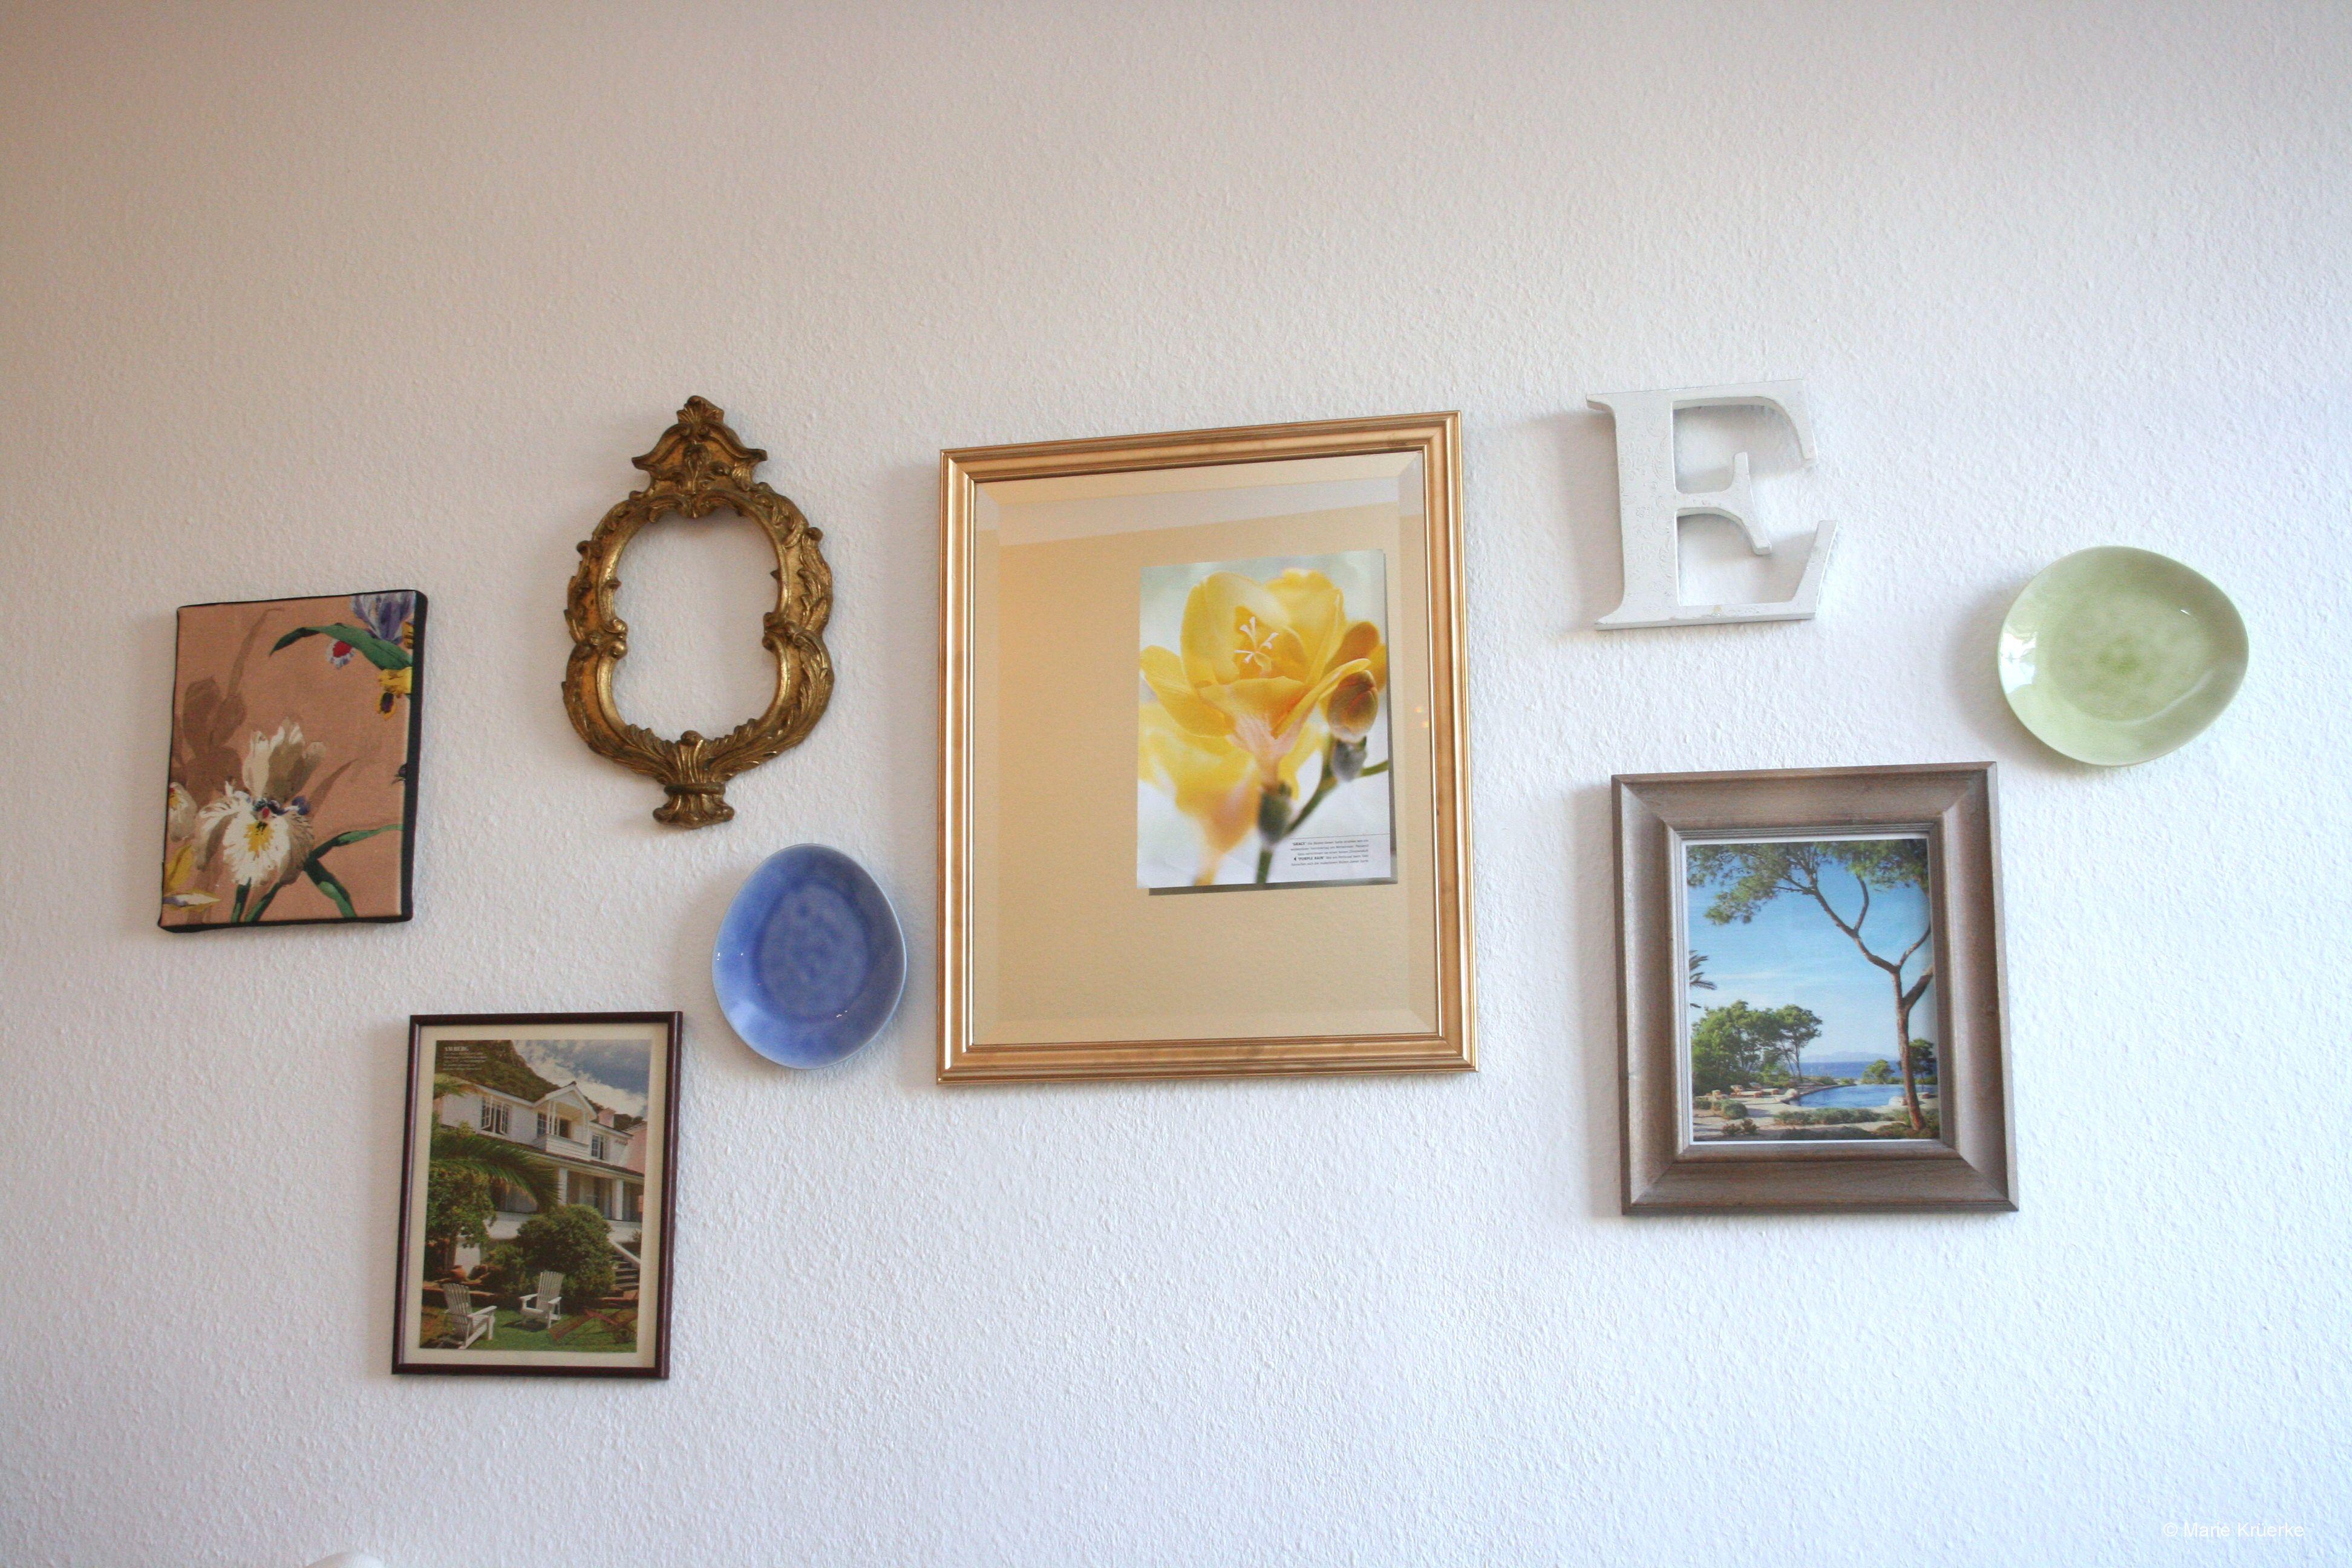 Wandteller wisper wisper - Spiegel orangerie ...